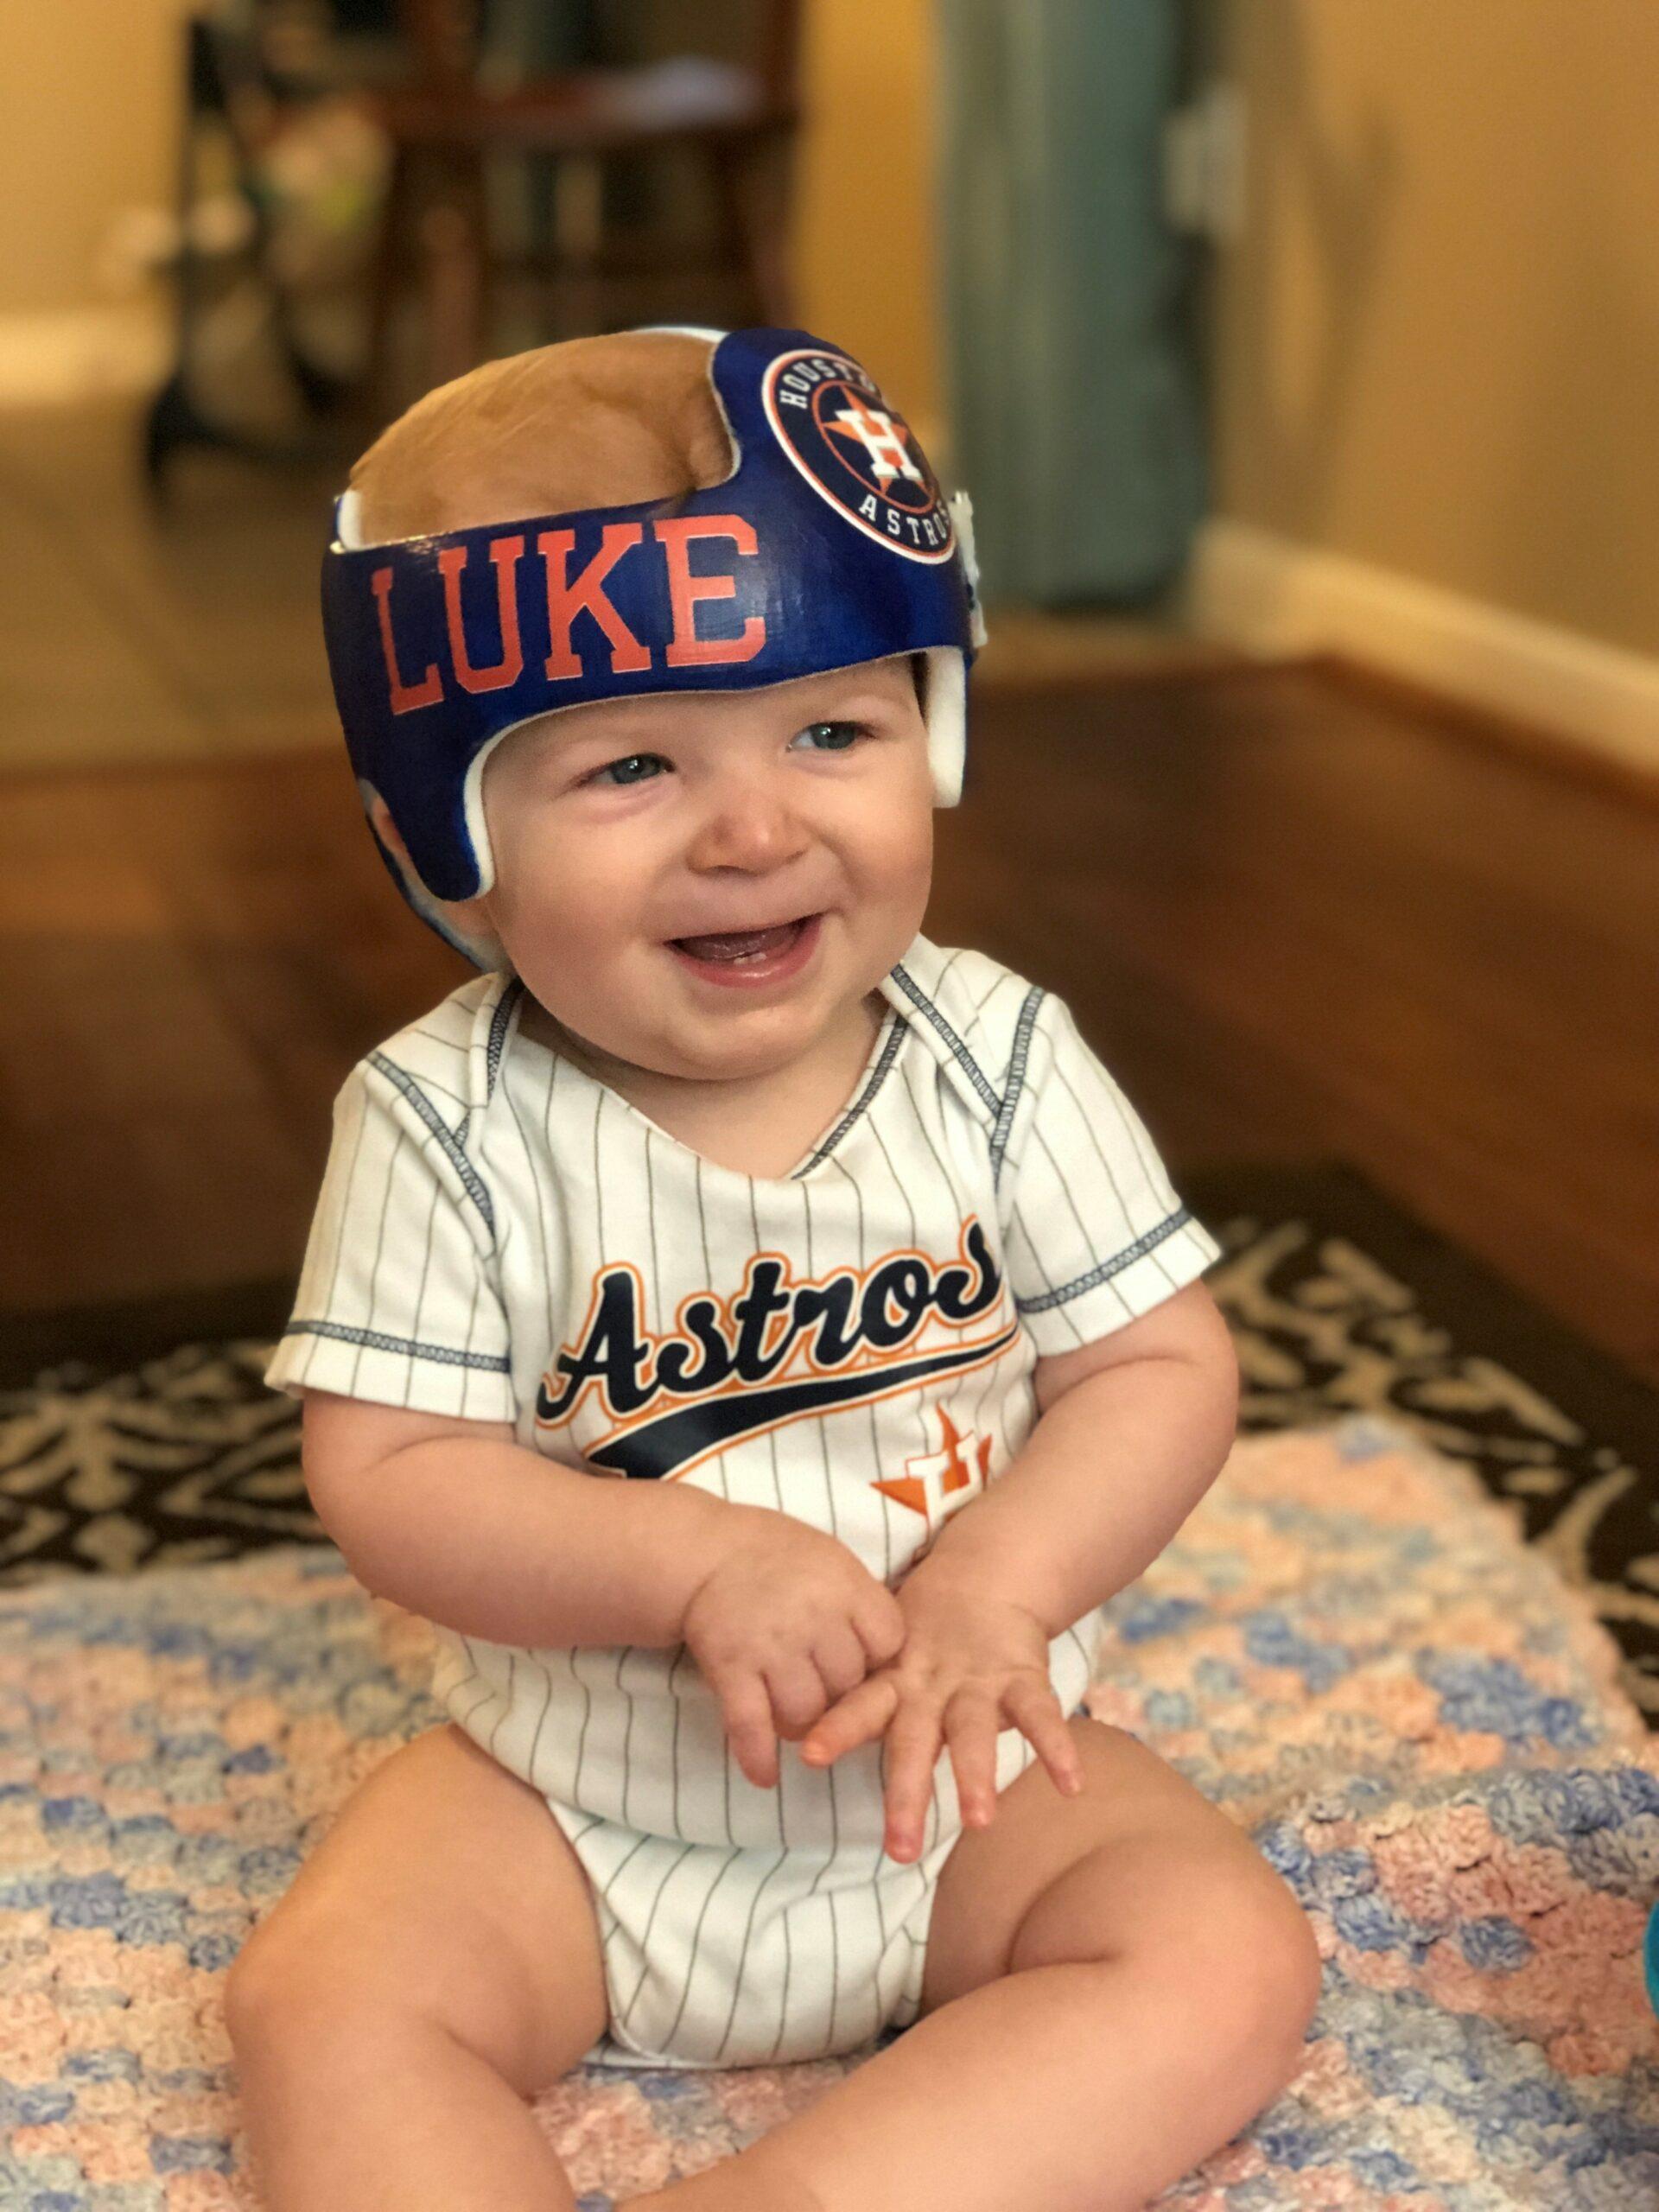 Houston Astros cranial band